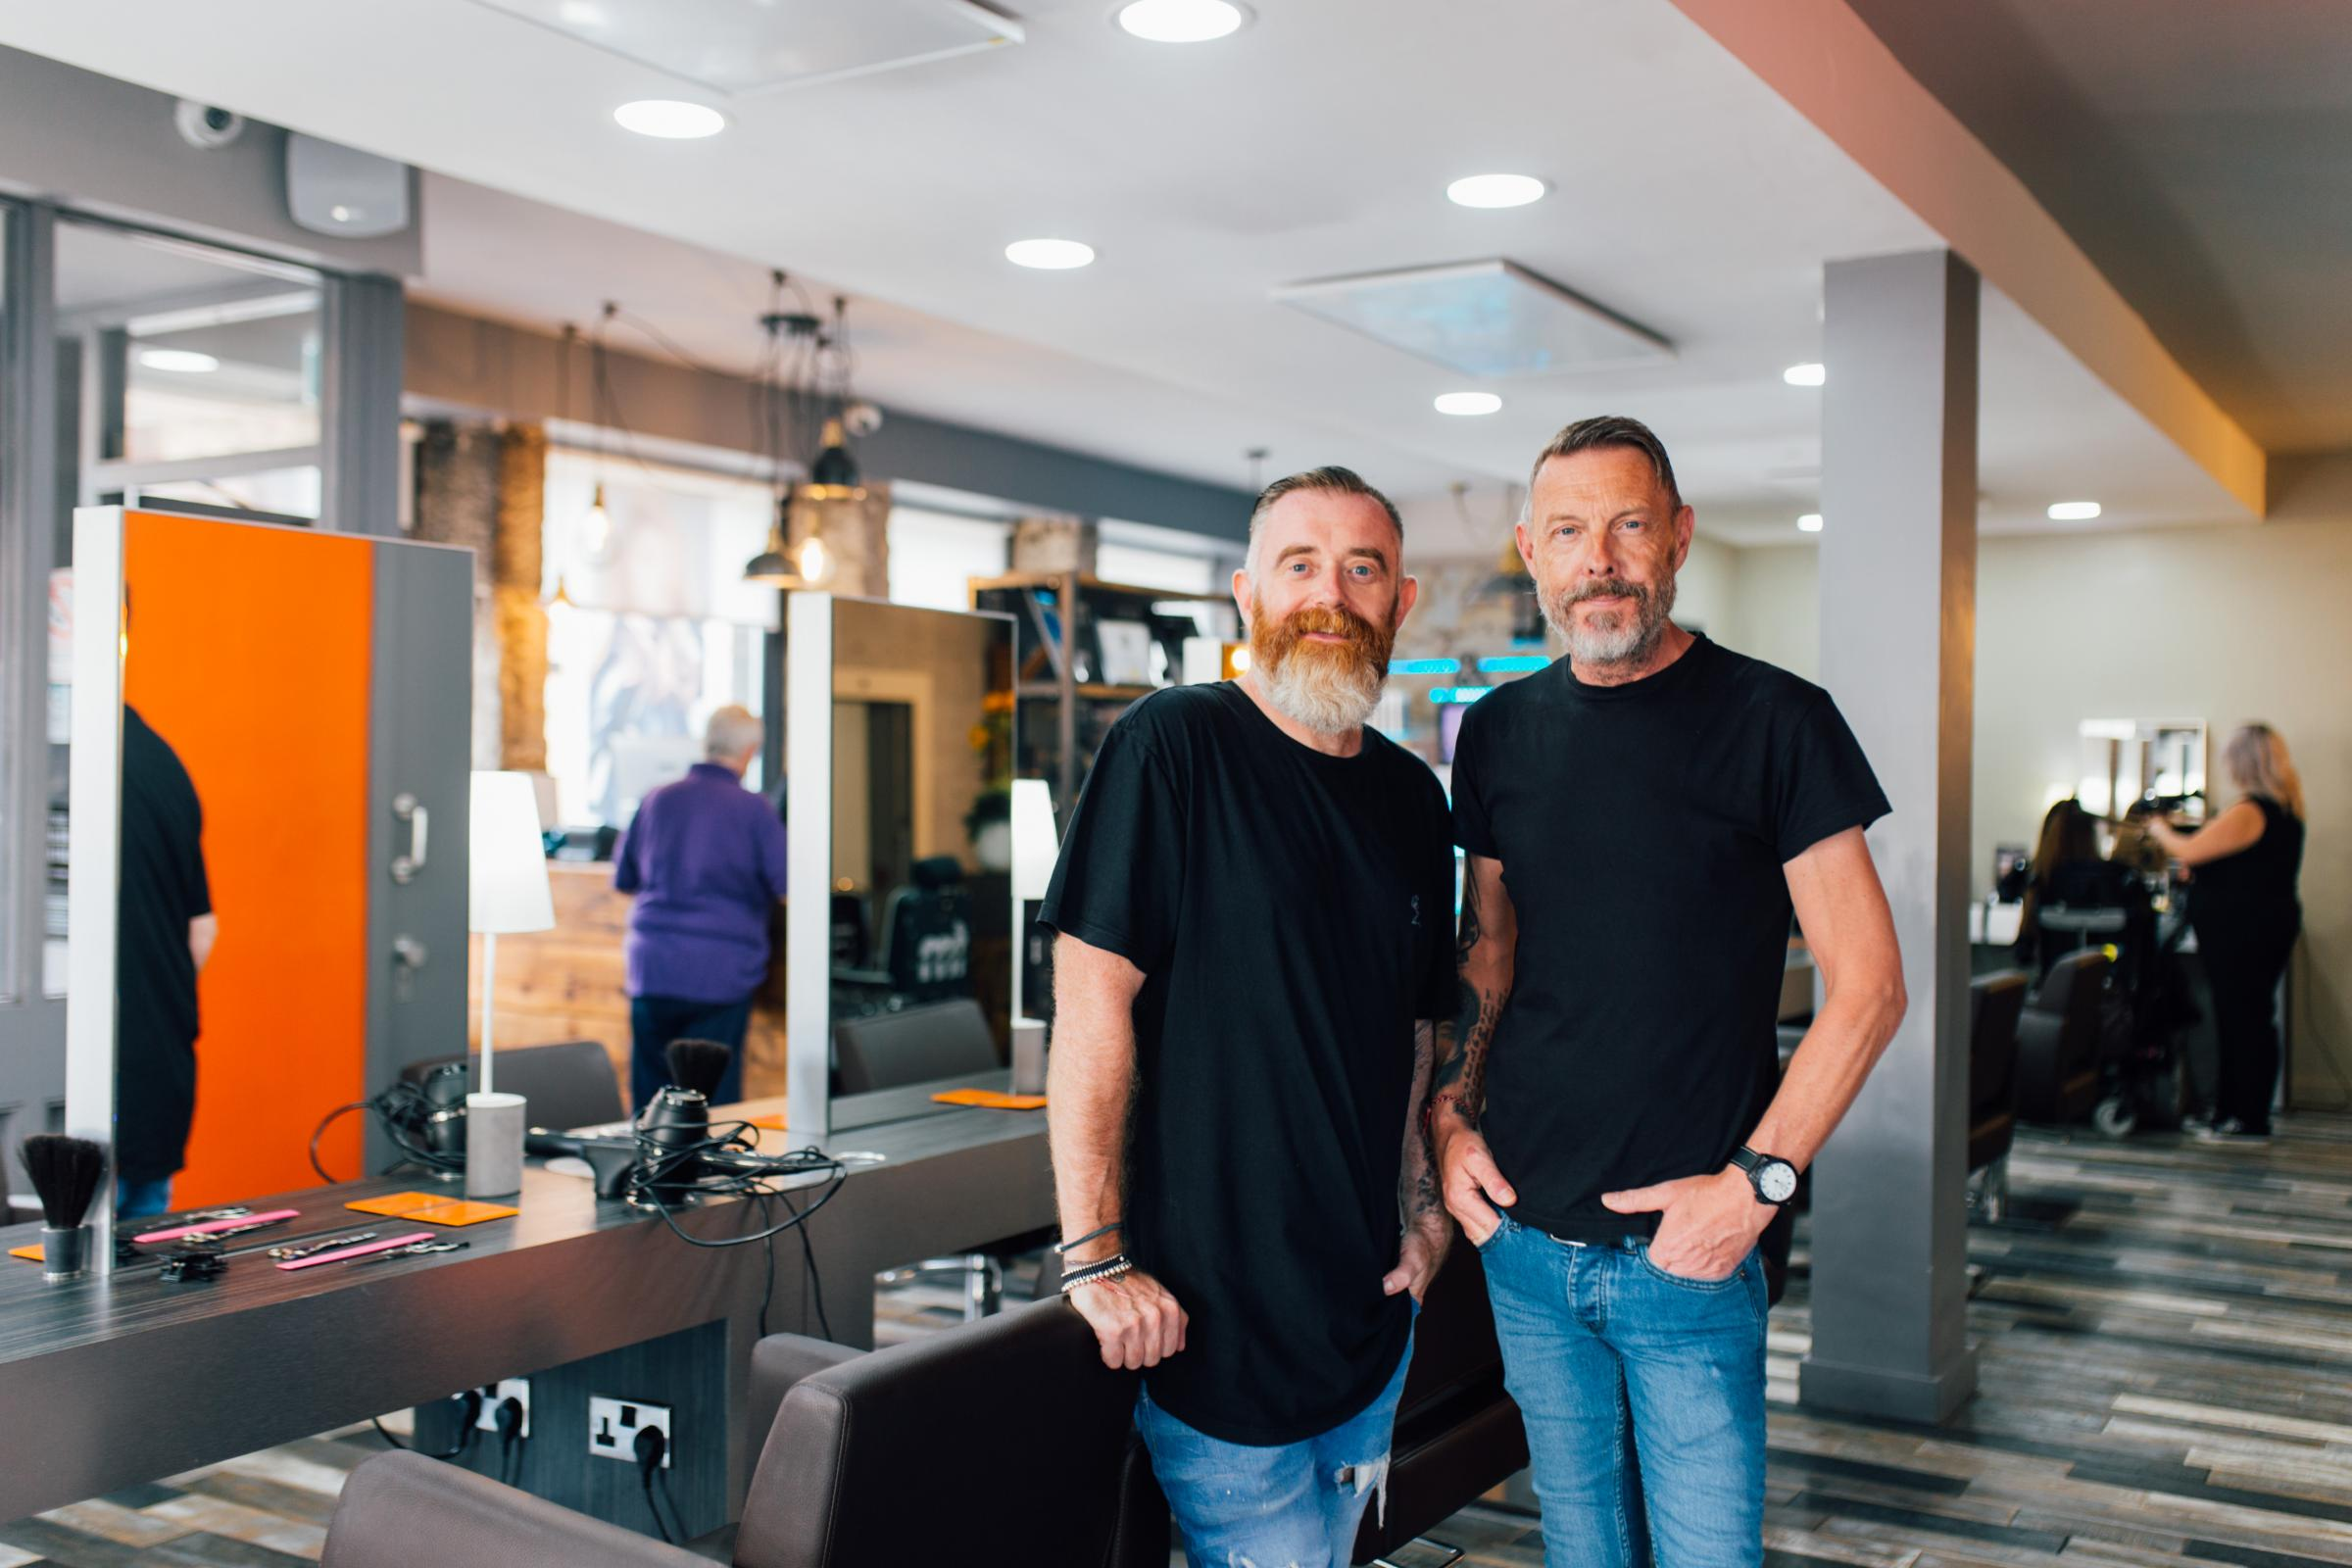 Barrhead: F&M Hairdressing celebrates 20th birthday